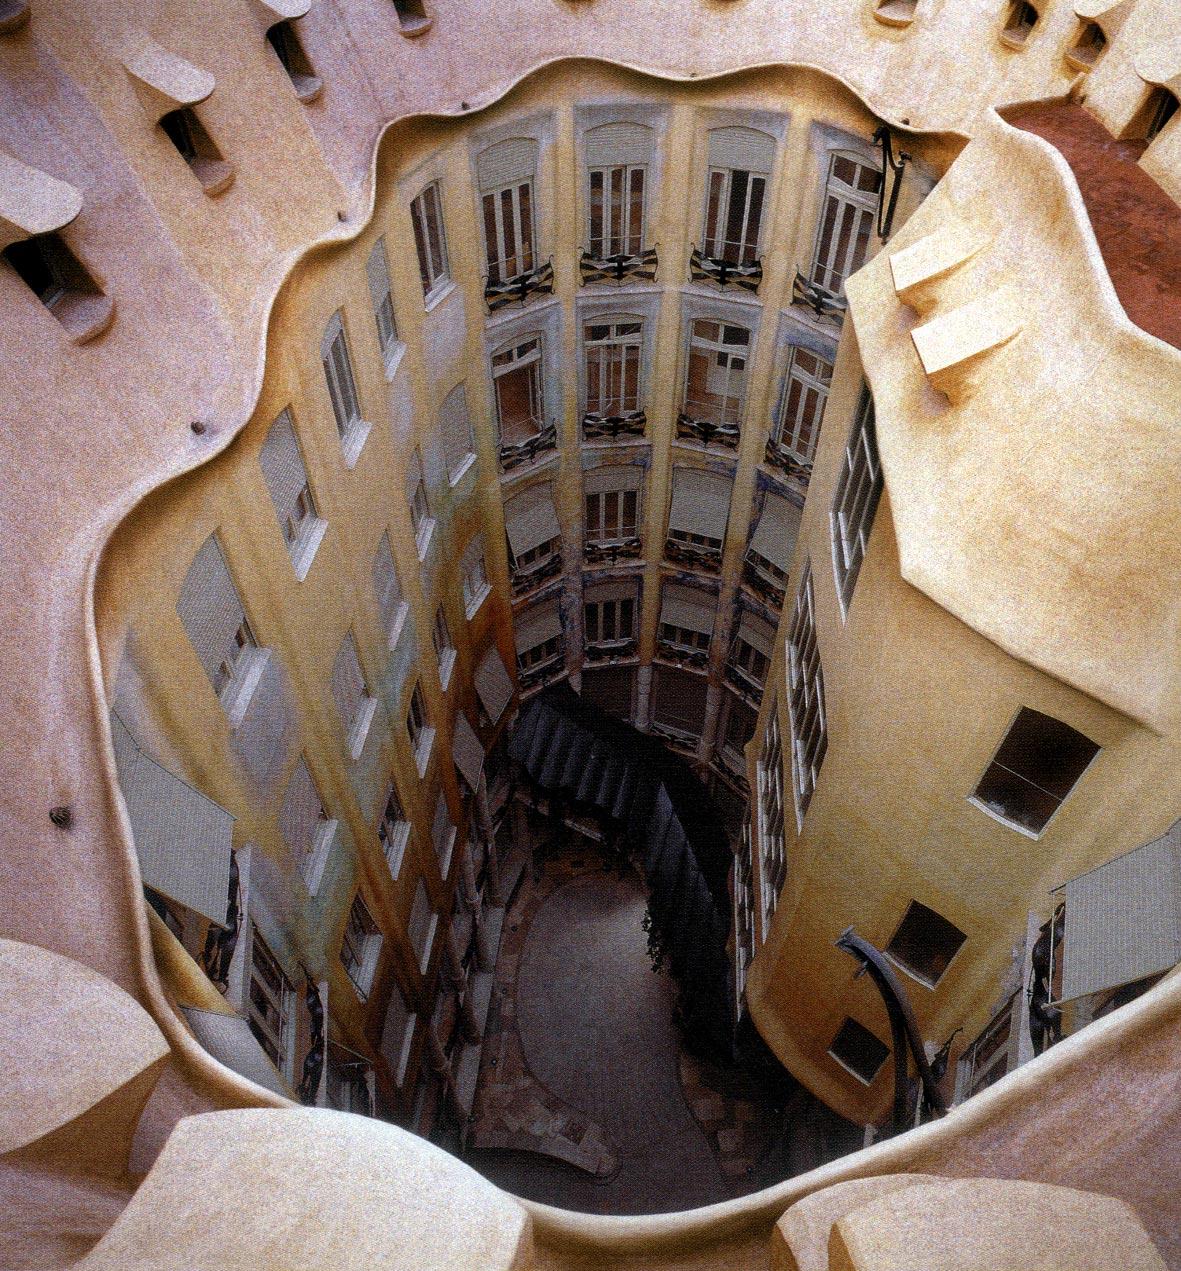 Barcellona gaudi 39 casa mila 39 la pedrera - Casa la pedrera gaudi ...